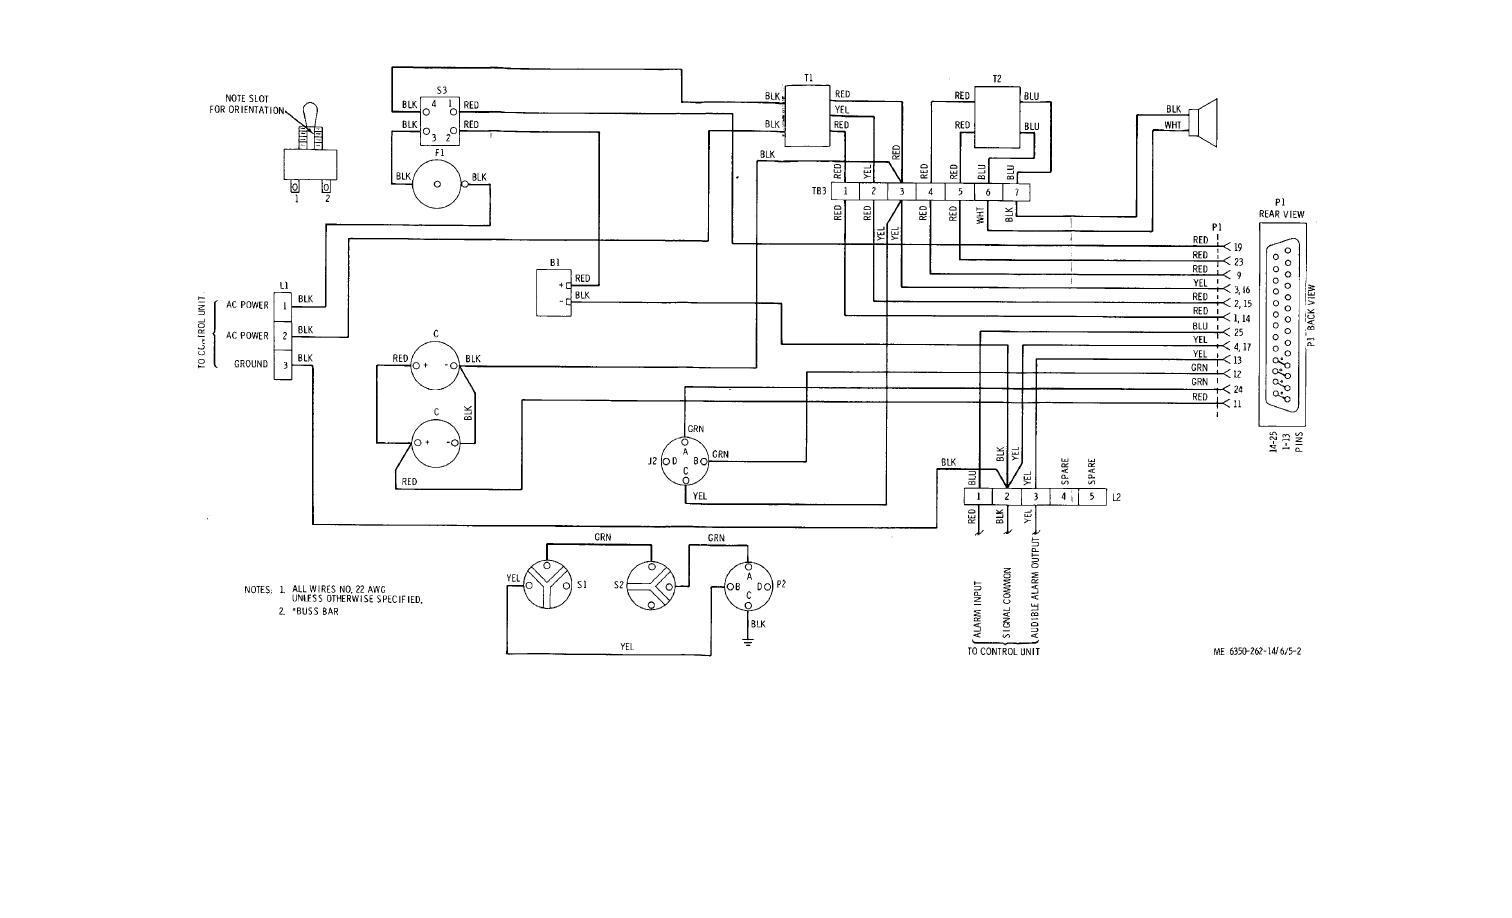 c tec conventional fire alarm wiring diagram